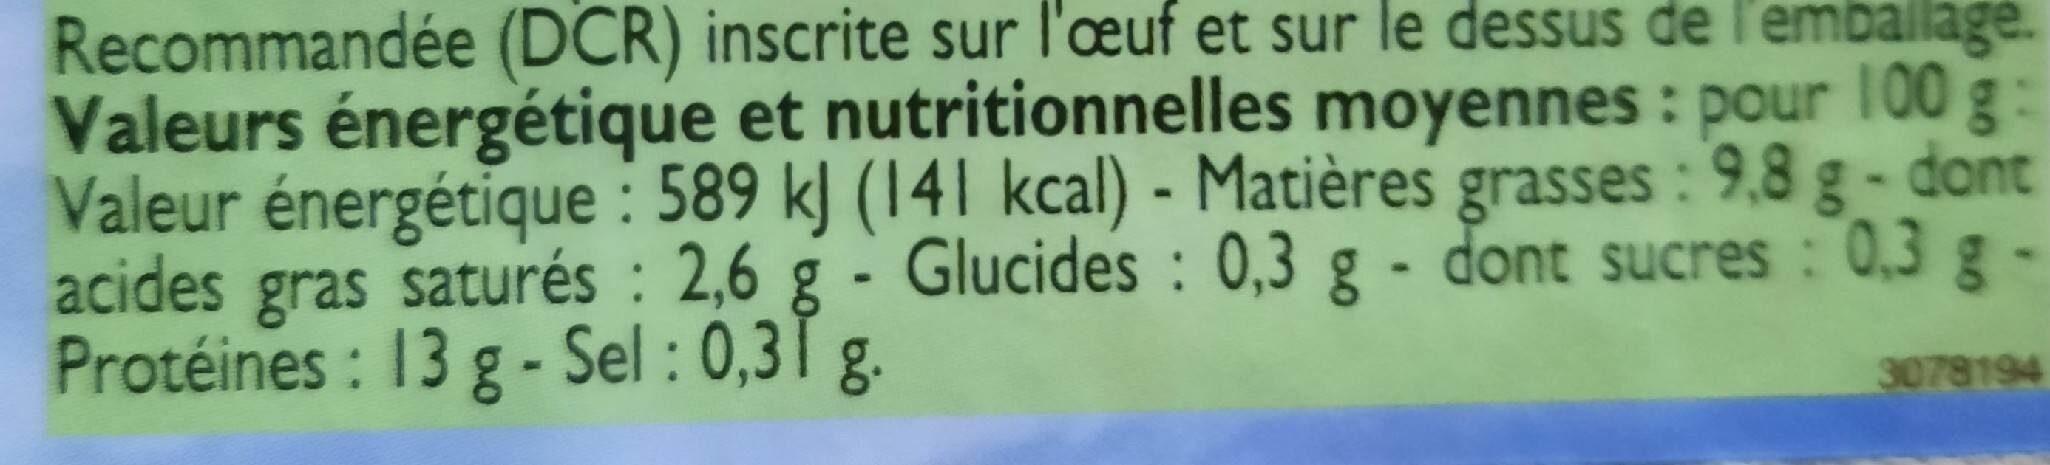 Œufs de poule plein air - Valori nutrizionali - fr